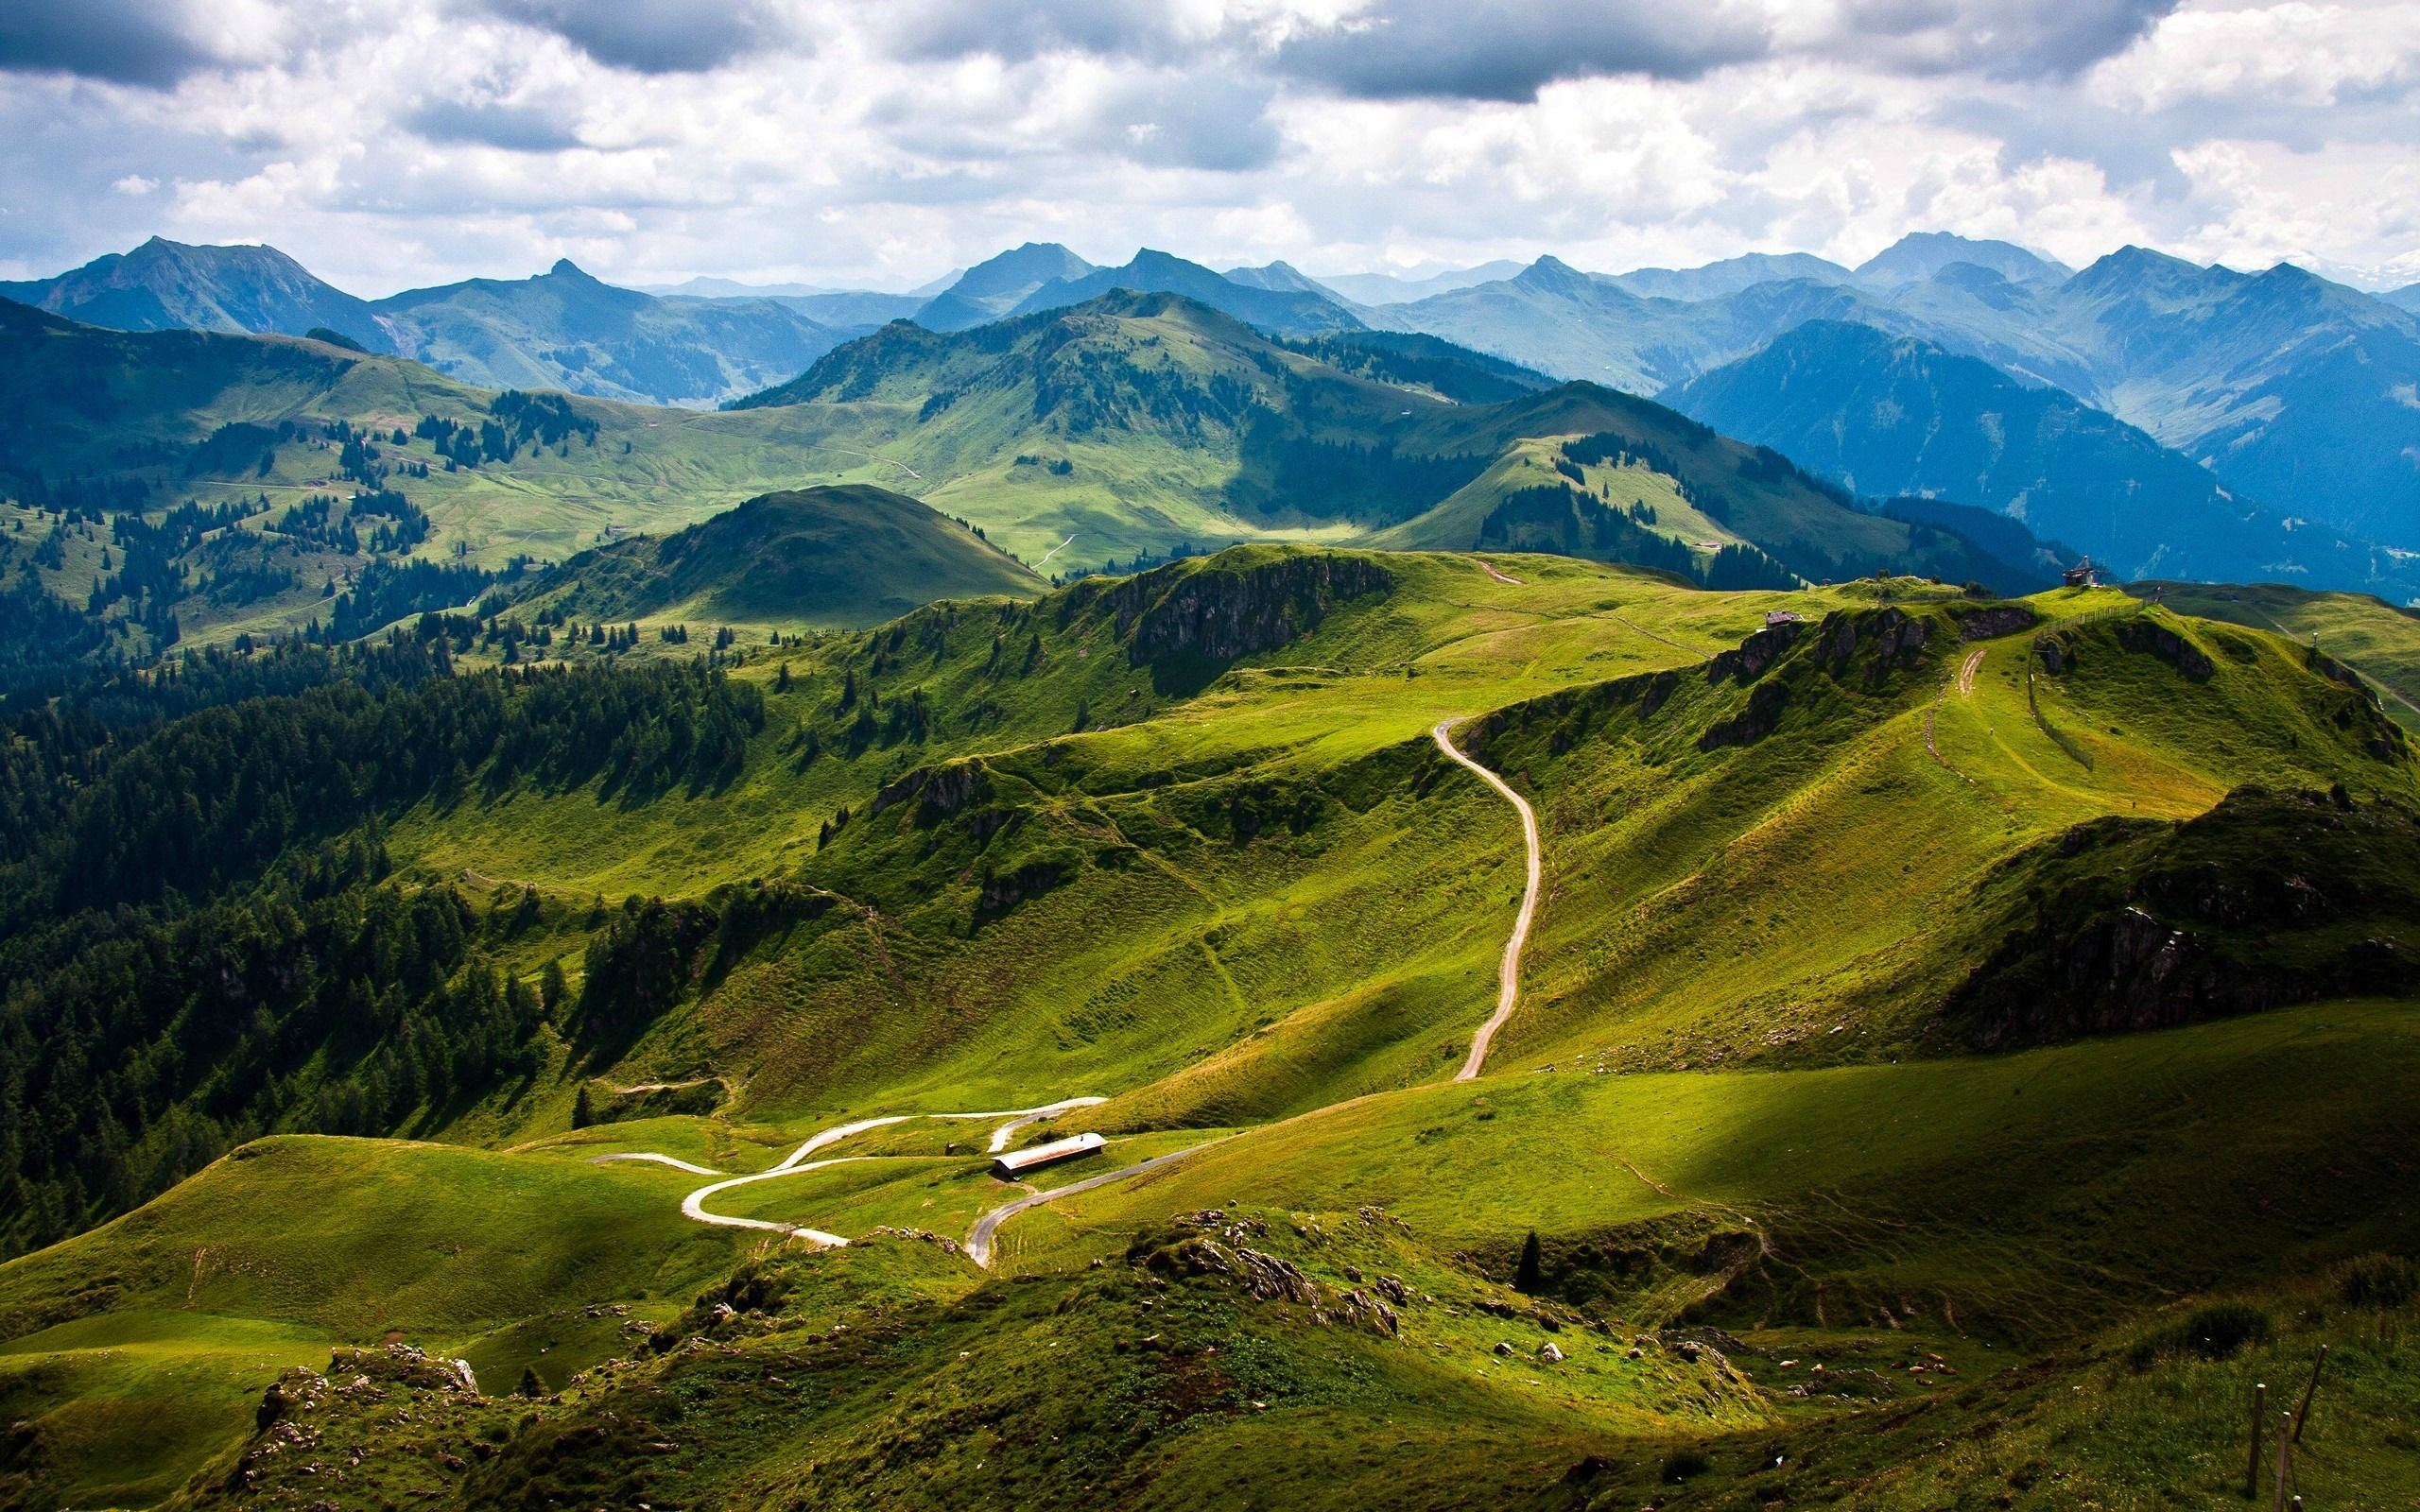 Landscape Mountain High Resolution